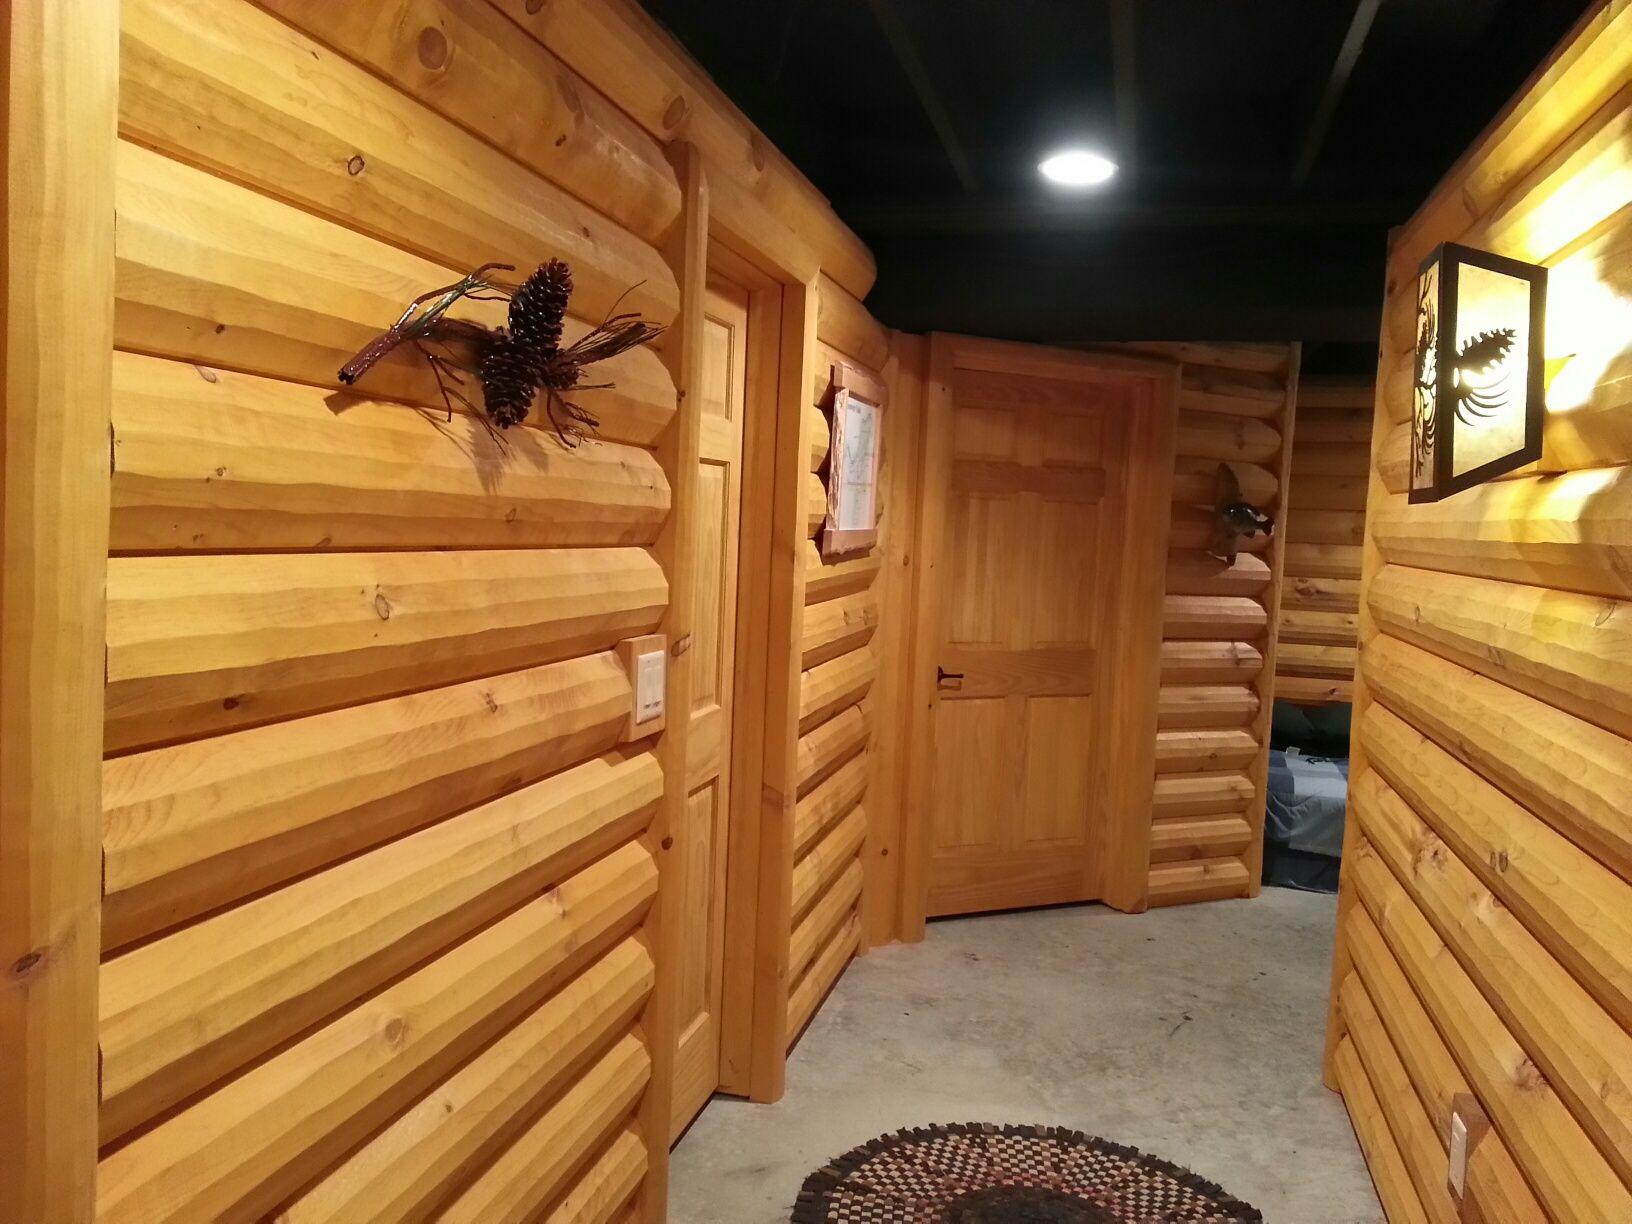 3x8 log siding hand hewn pine - 3x8 Log Siding In Hallway